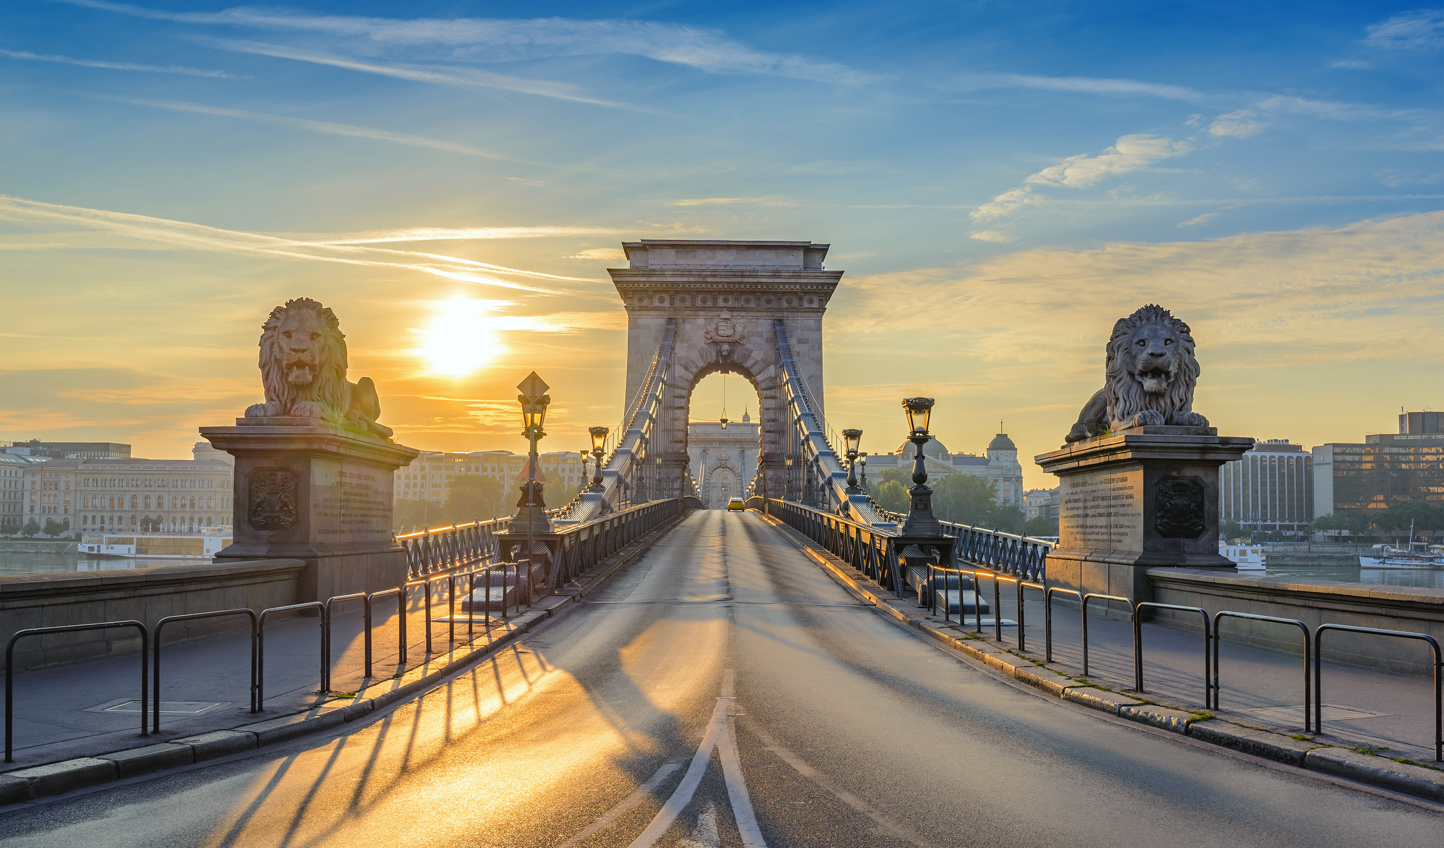 Stroll across the Chain Bridge